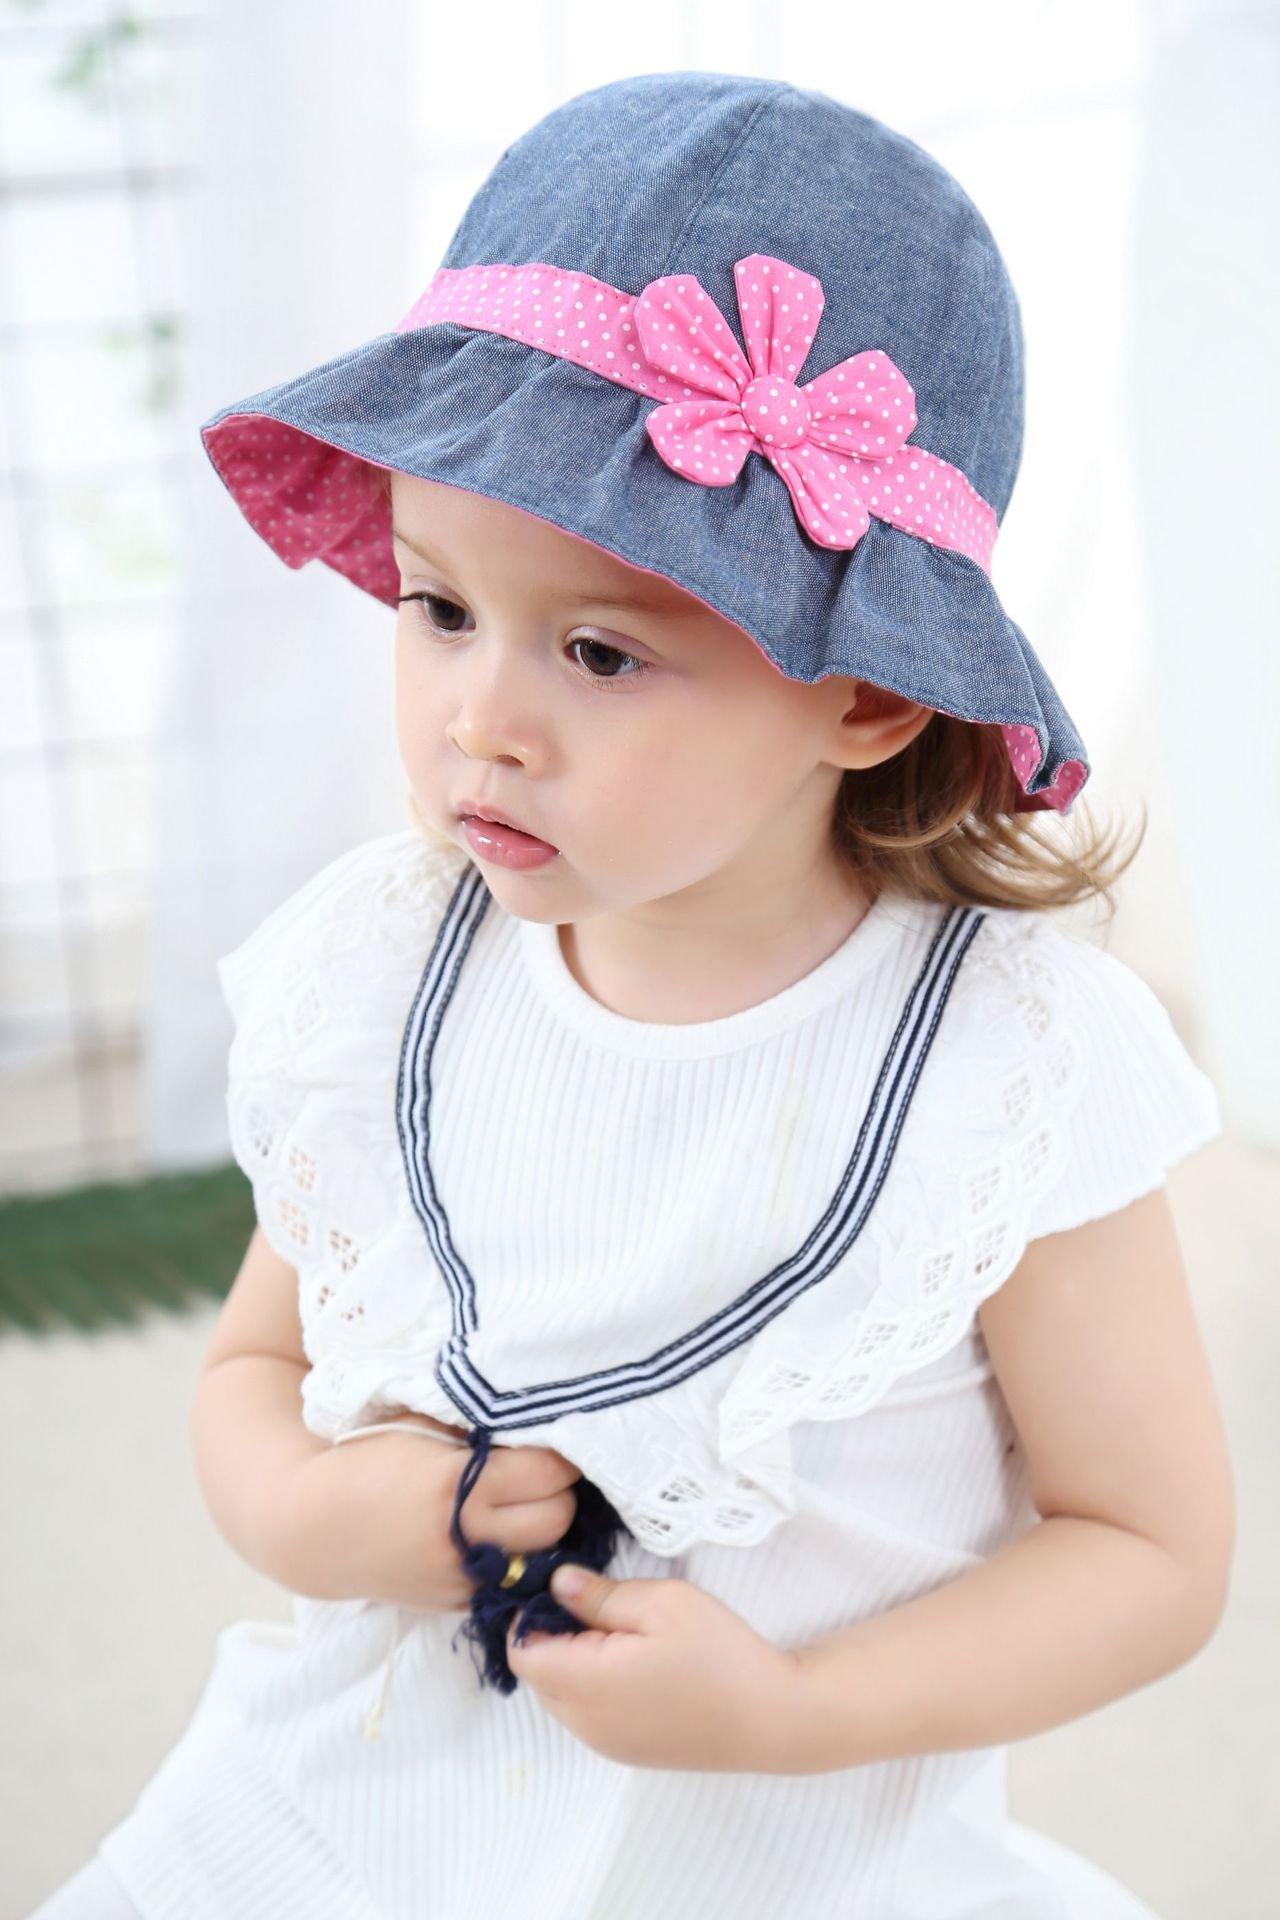 Toddler Baby Girls Denim Sun Hats with Chin Strap Kid Summer Cotton Sunhat Polka Dot Caps by HUIXIANG (Image #8)